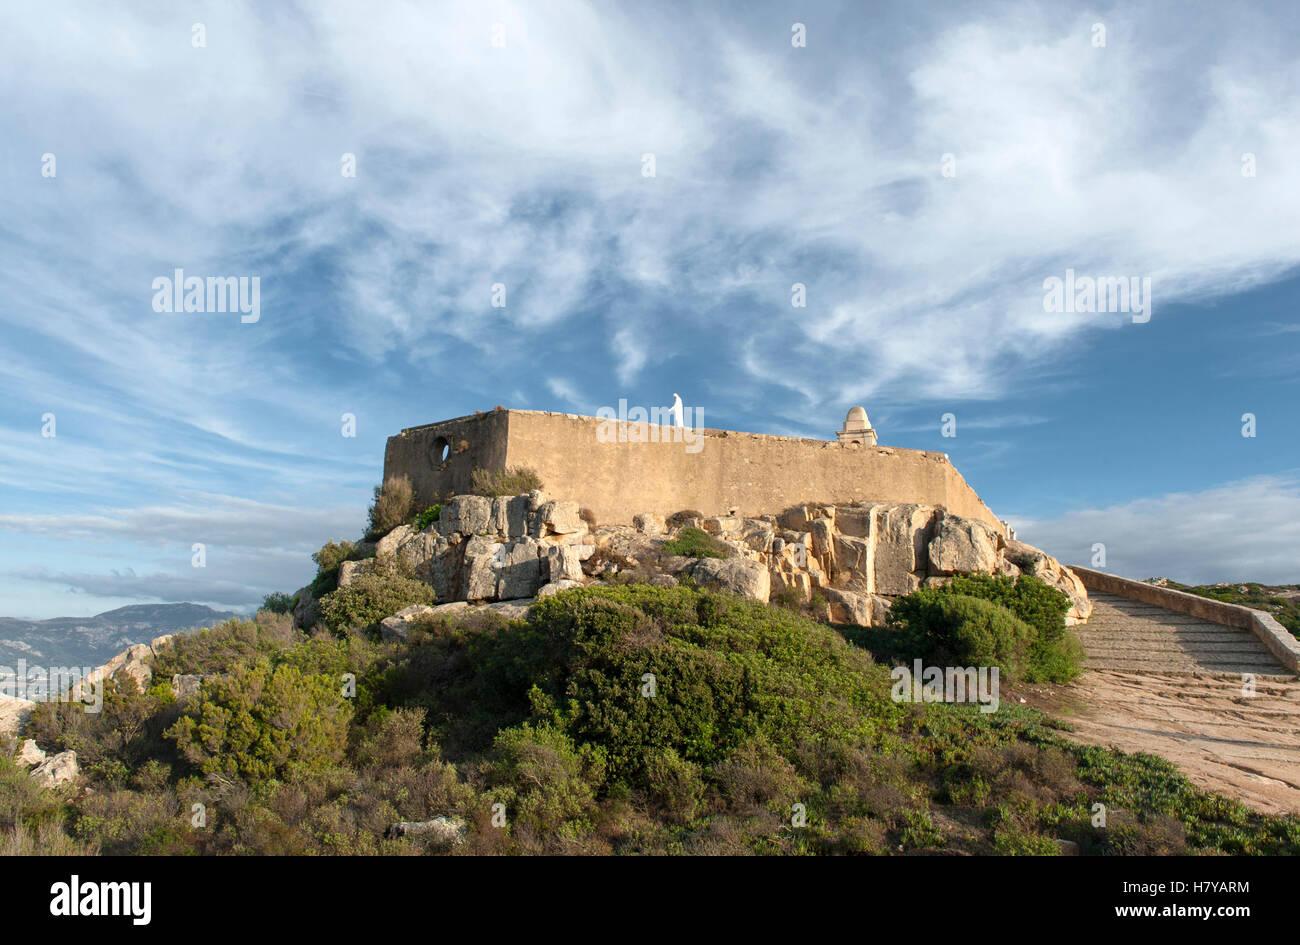 The small chapel of Notre Dame de la Serra on the rocks above the town of Calvi, Haute-Corse, France - Stock Image